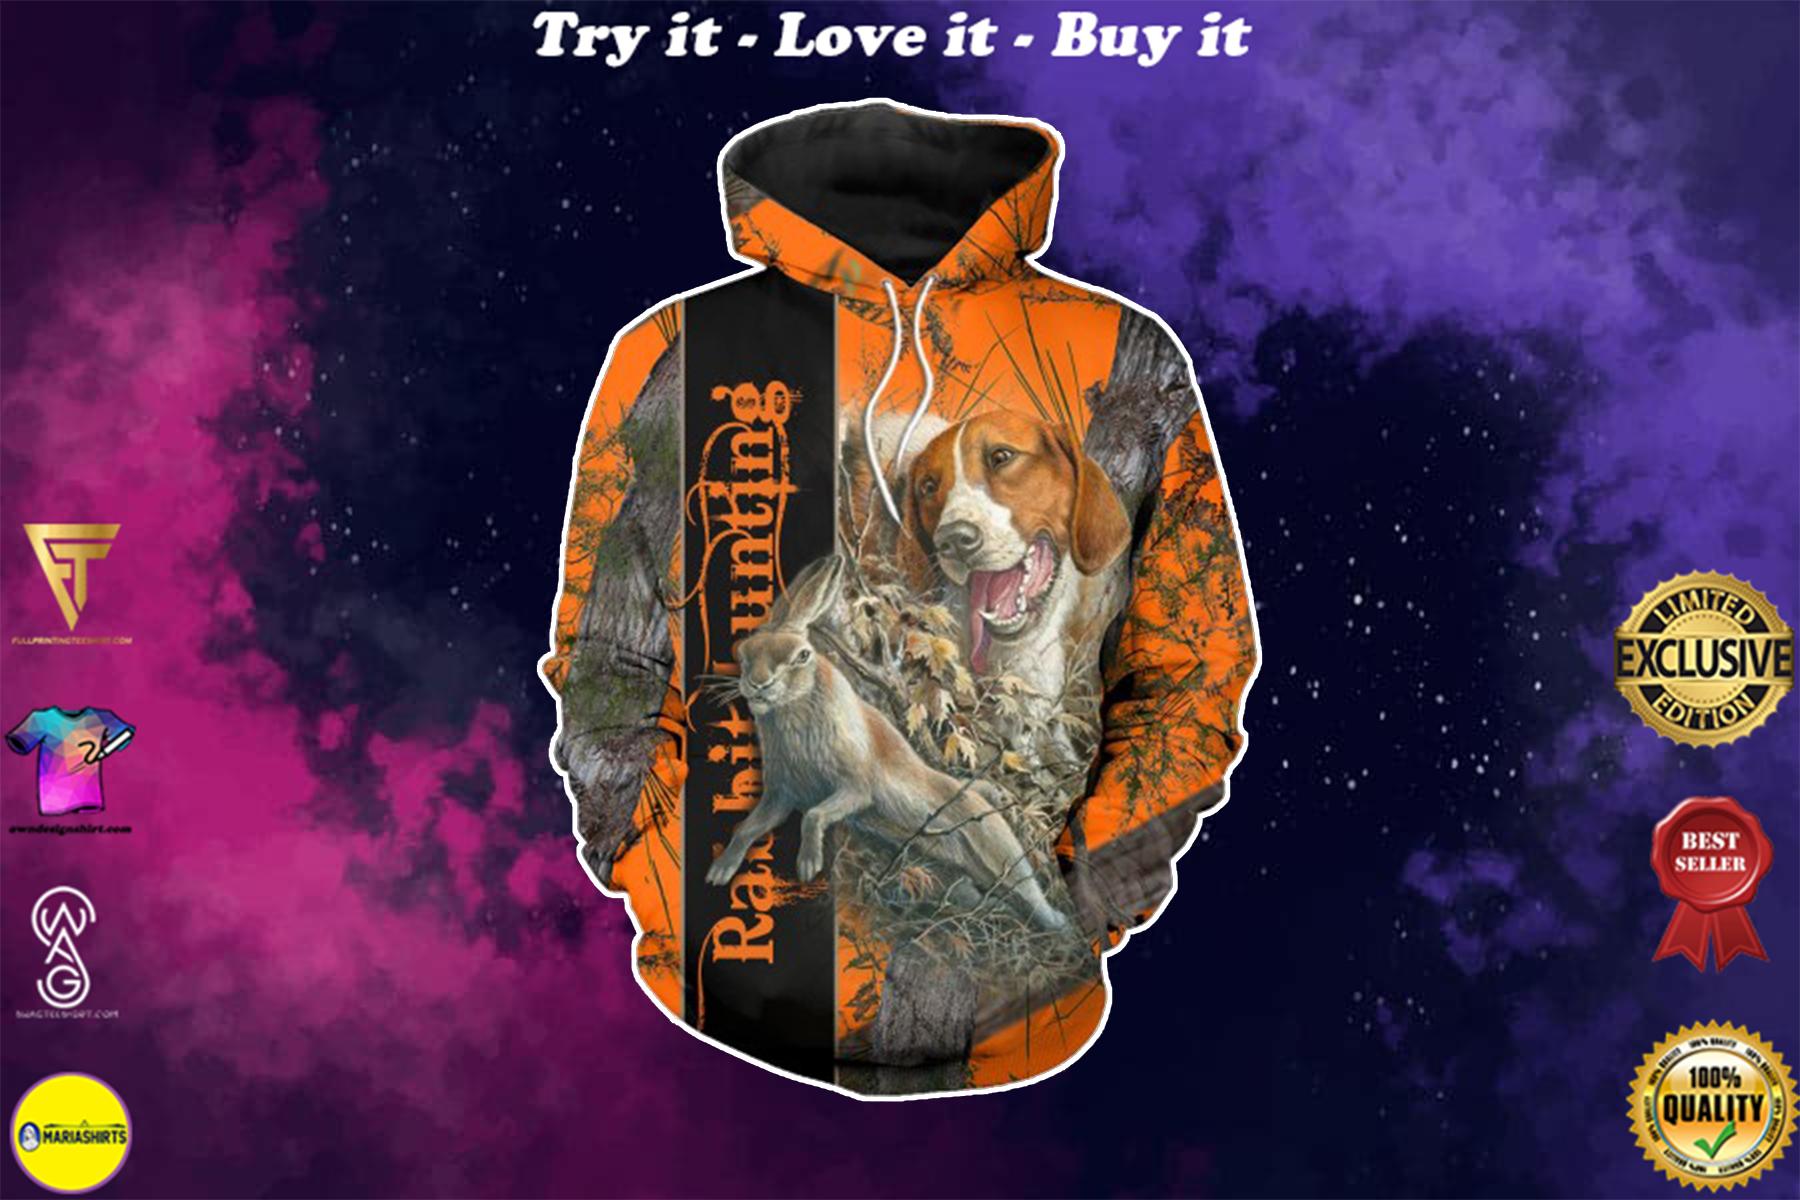 beagle hunting rabbit camo style full over printed shirt